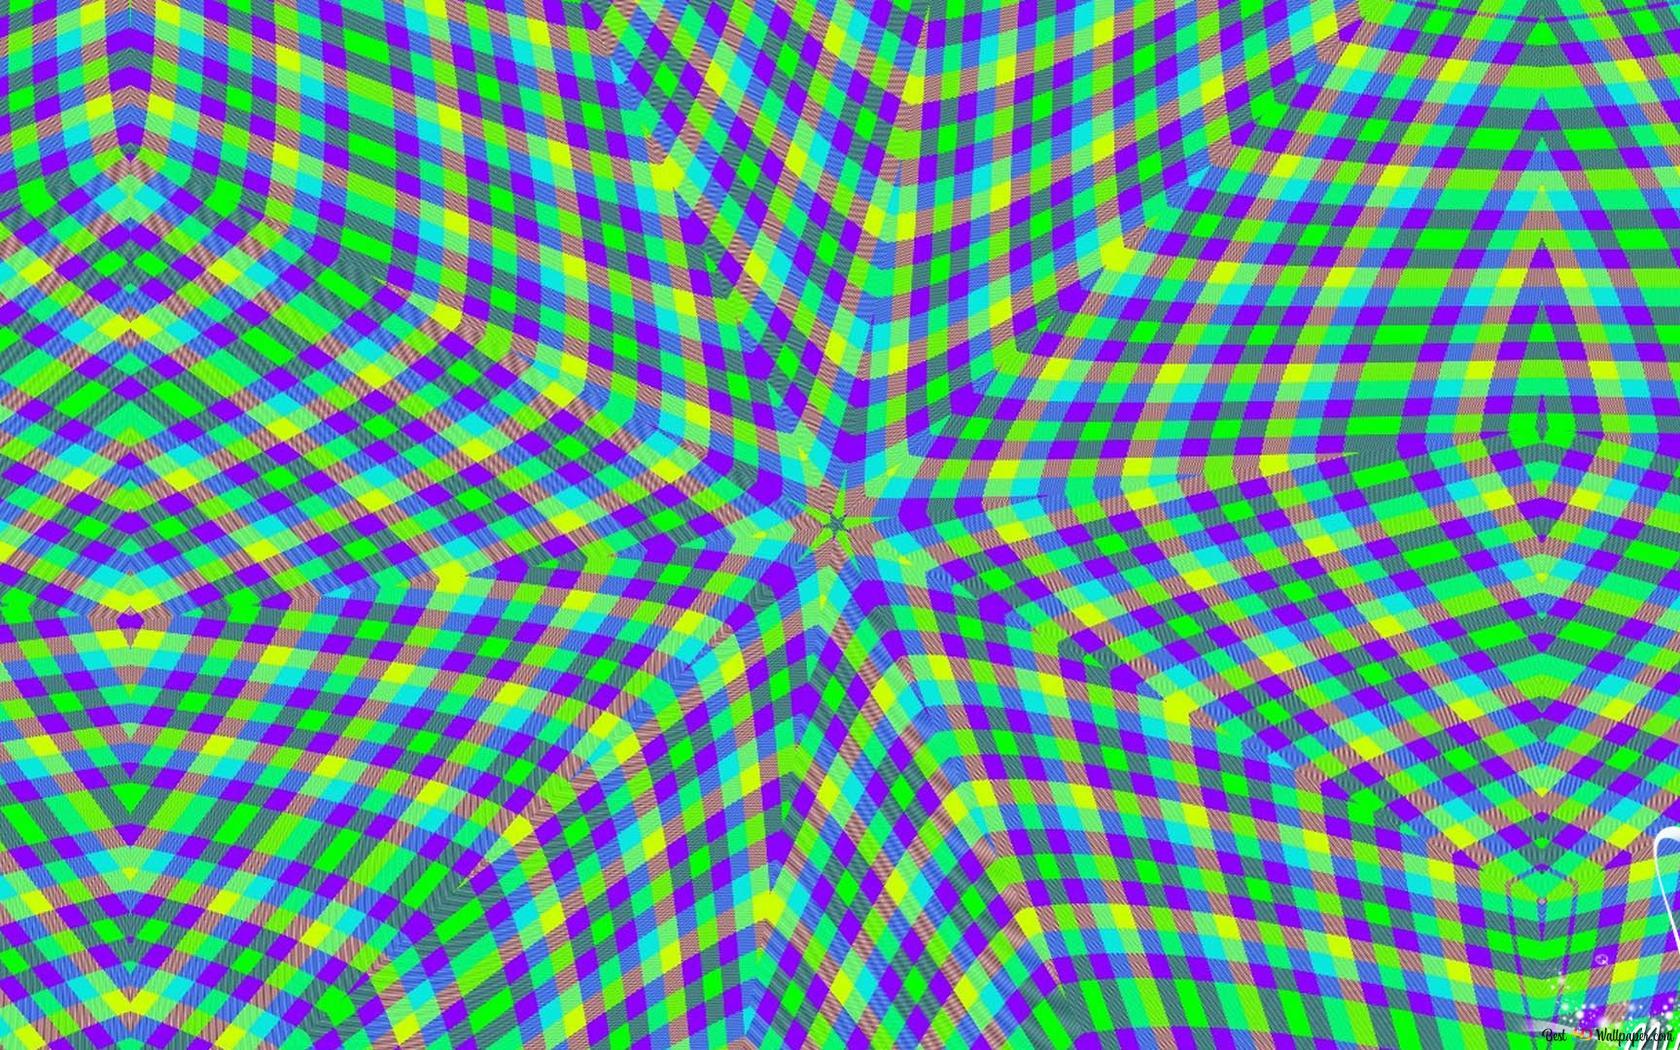 Kaleidoscope Xadrez 2 Hd Wallpaper Download